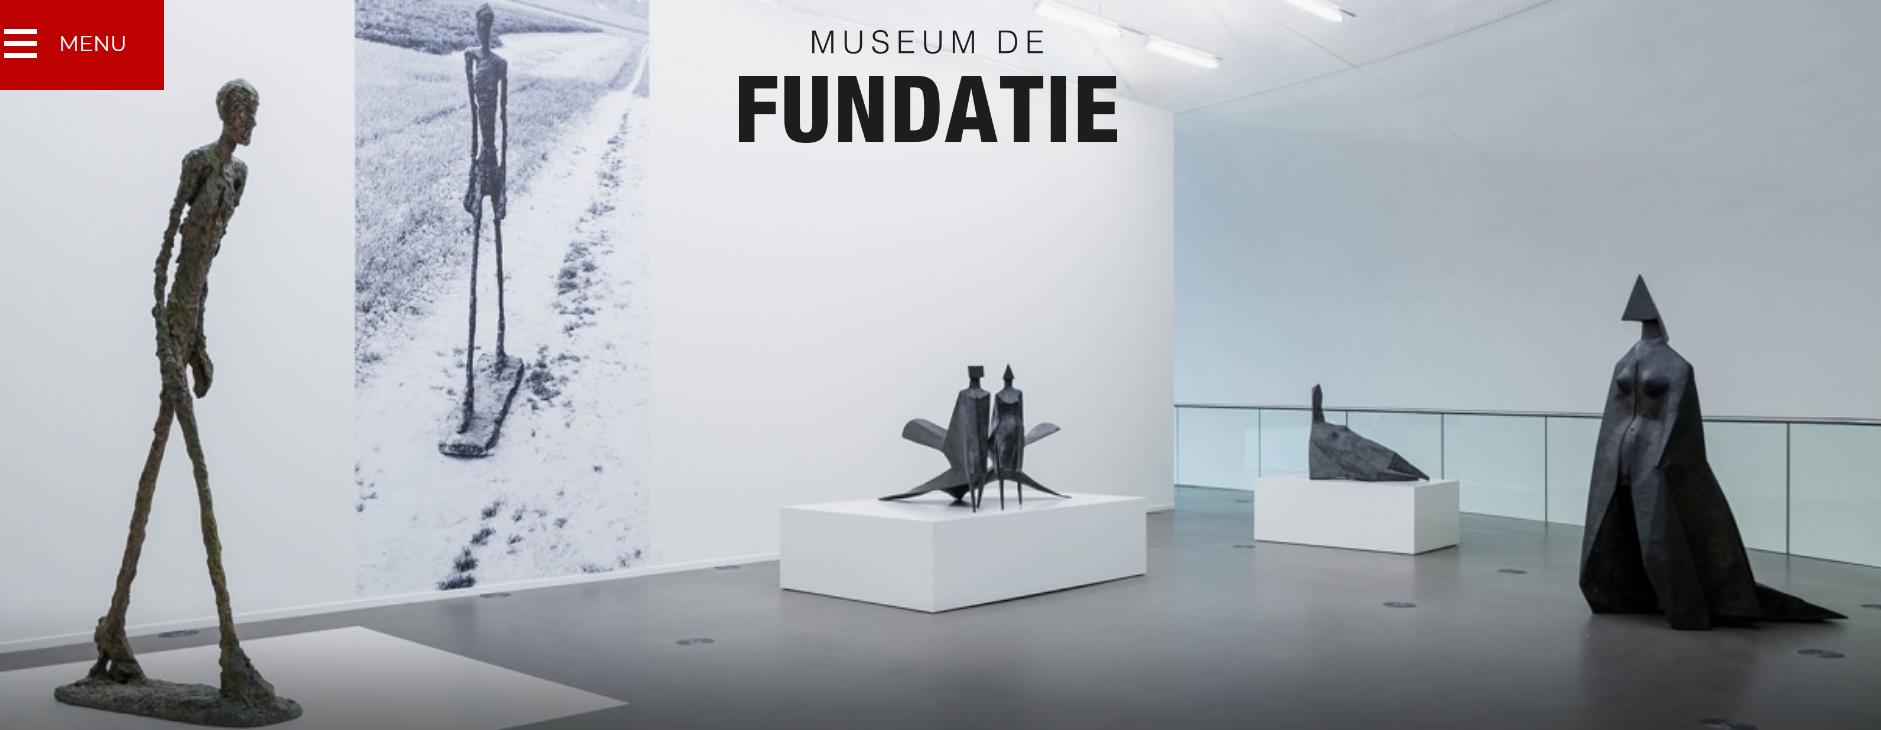 Museum De Fundatie met tentoonstelling Giacometti en Chadwick